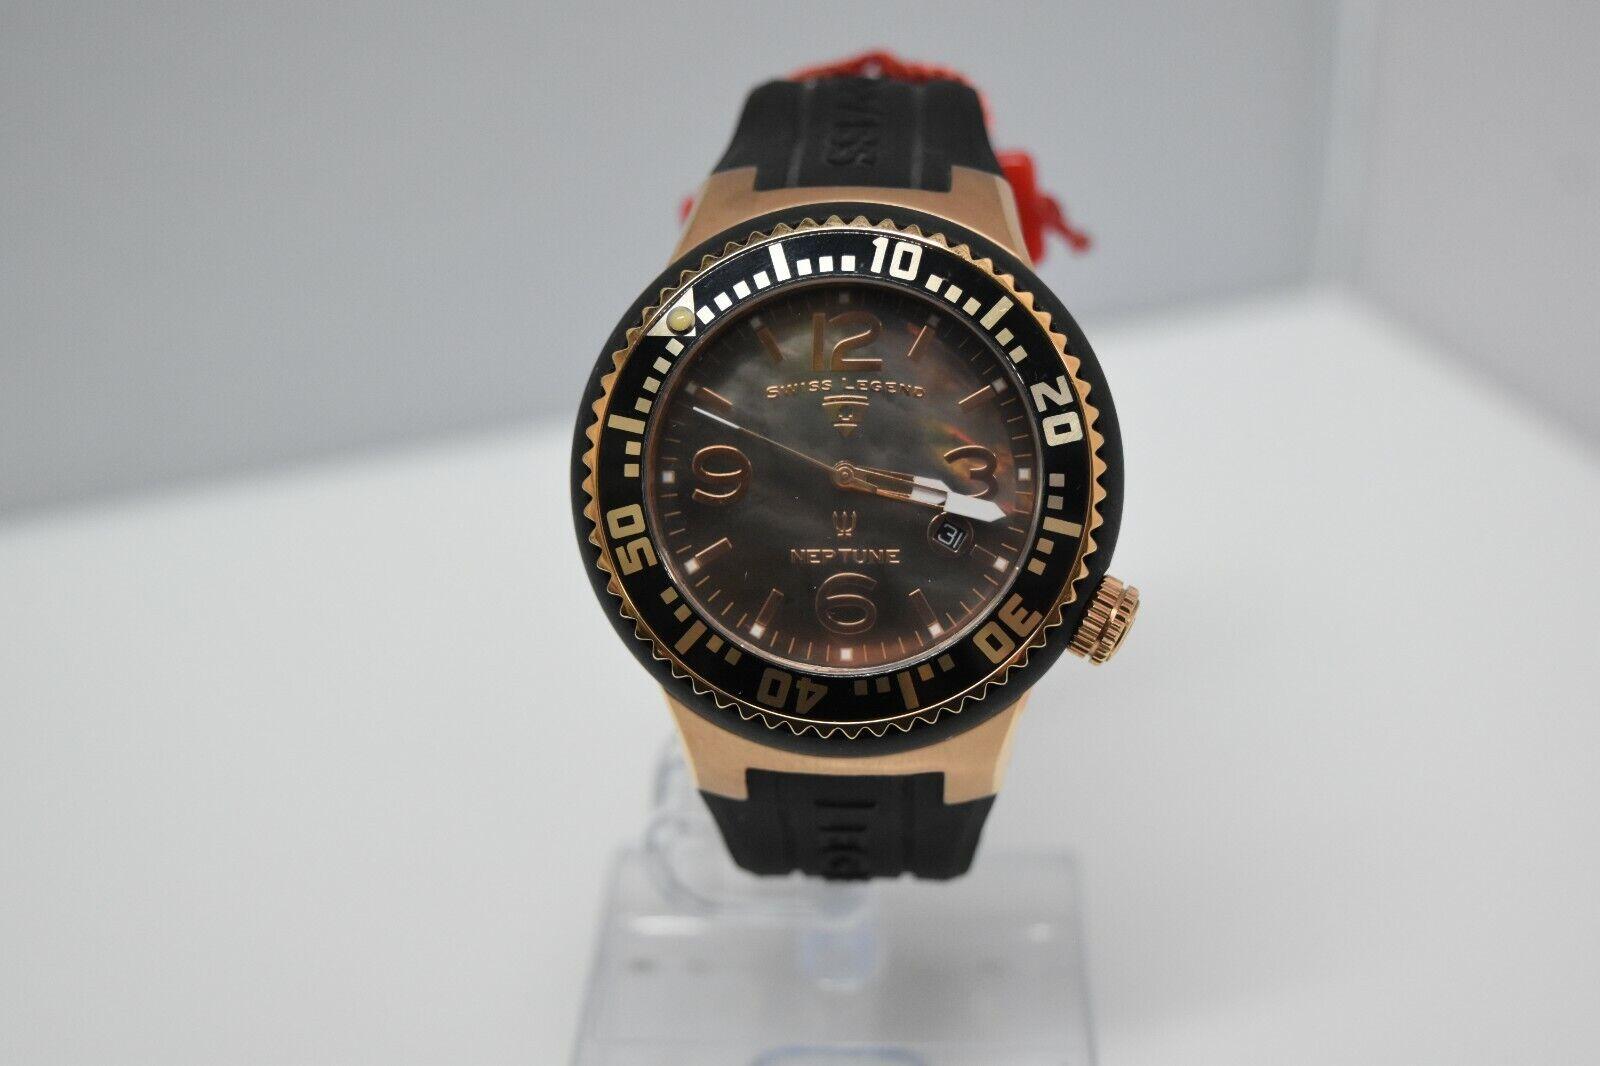 Swiss Legend Swiss Sapphitek 48mm SL-21848P Watch Black/RG/Black MOP